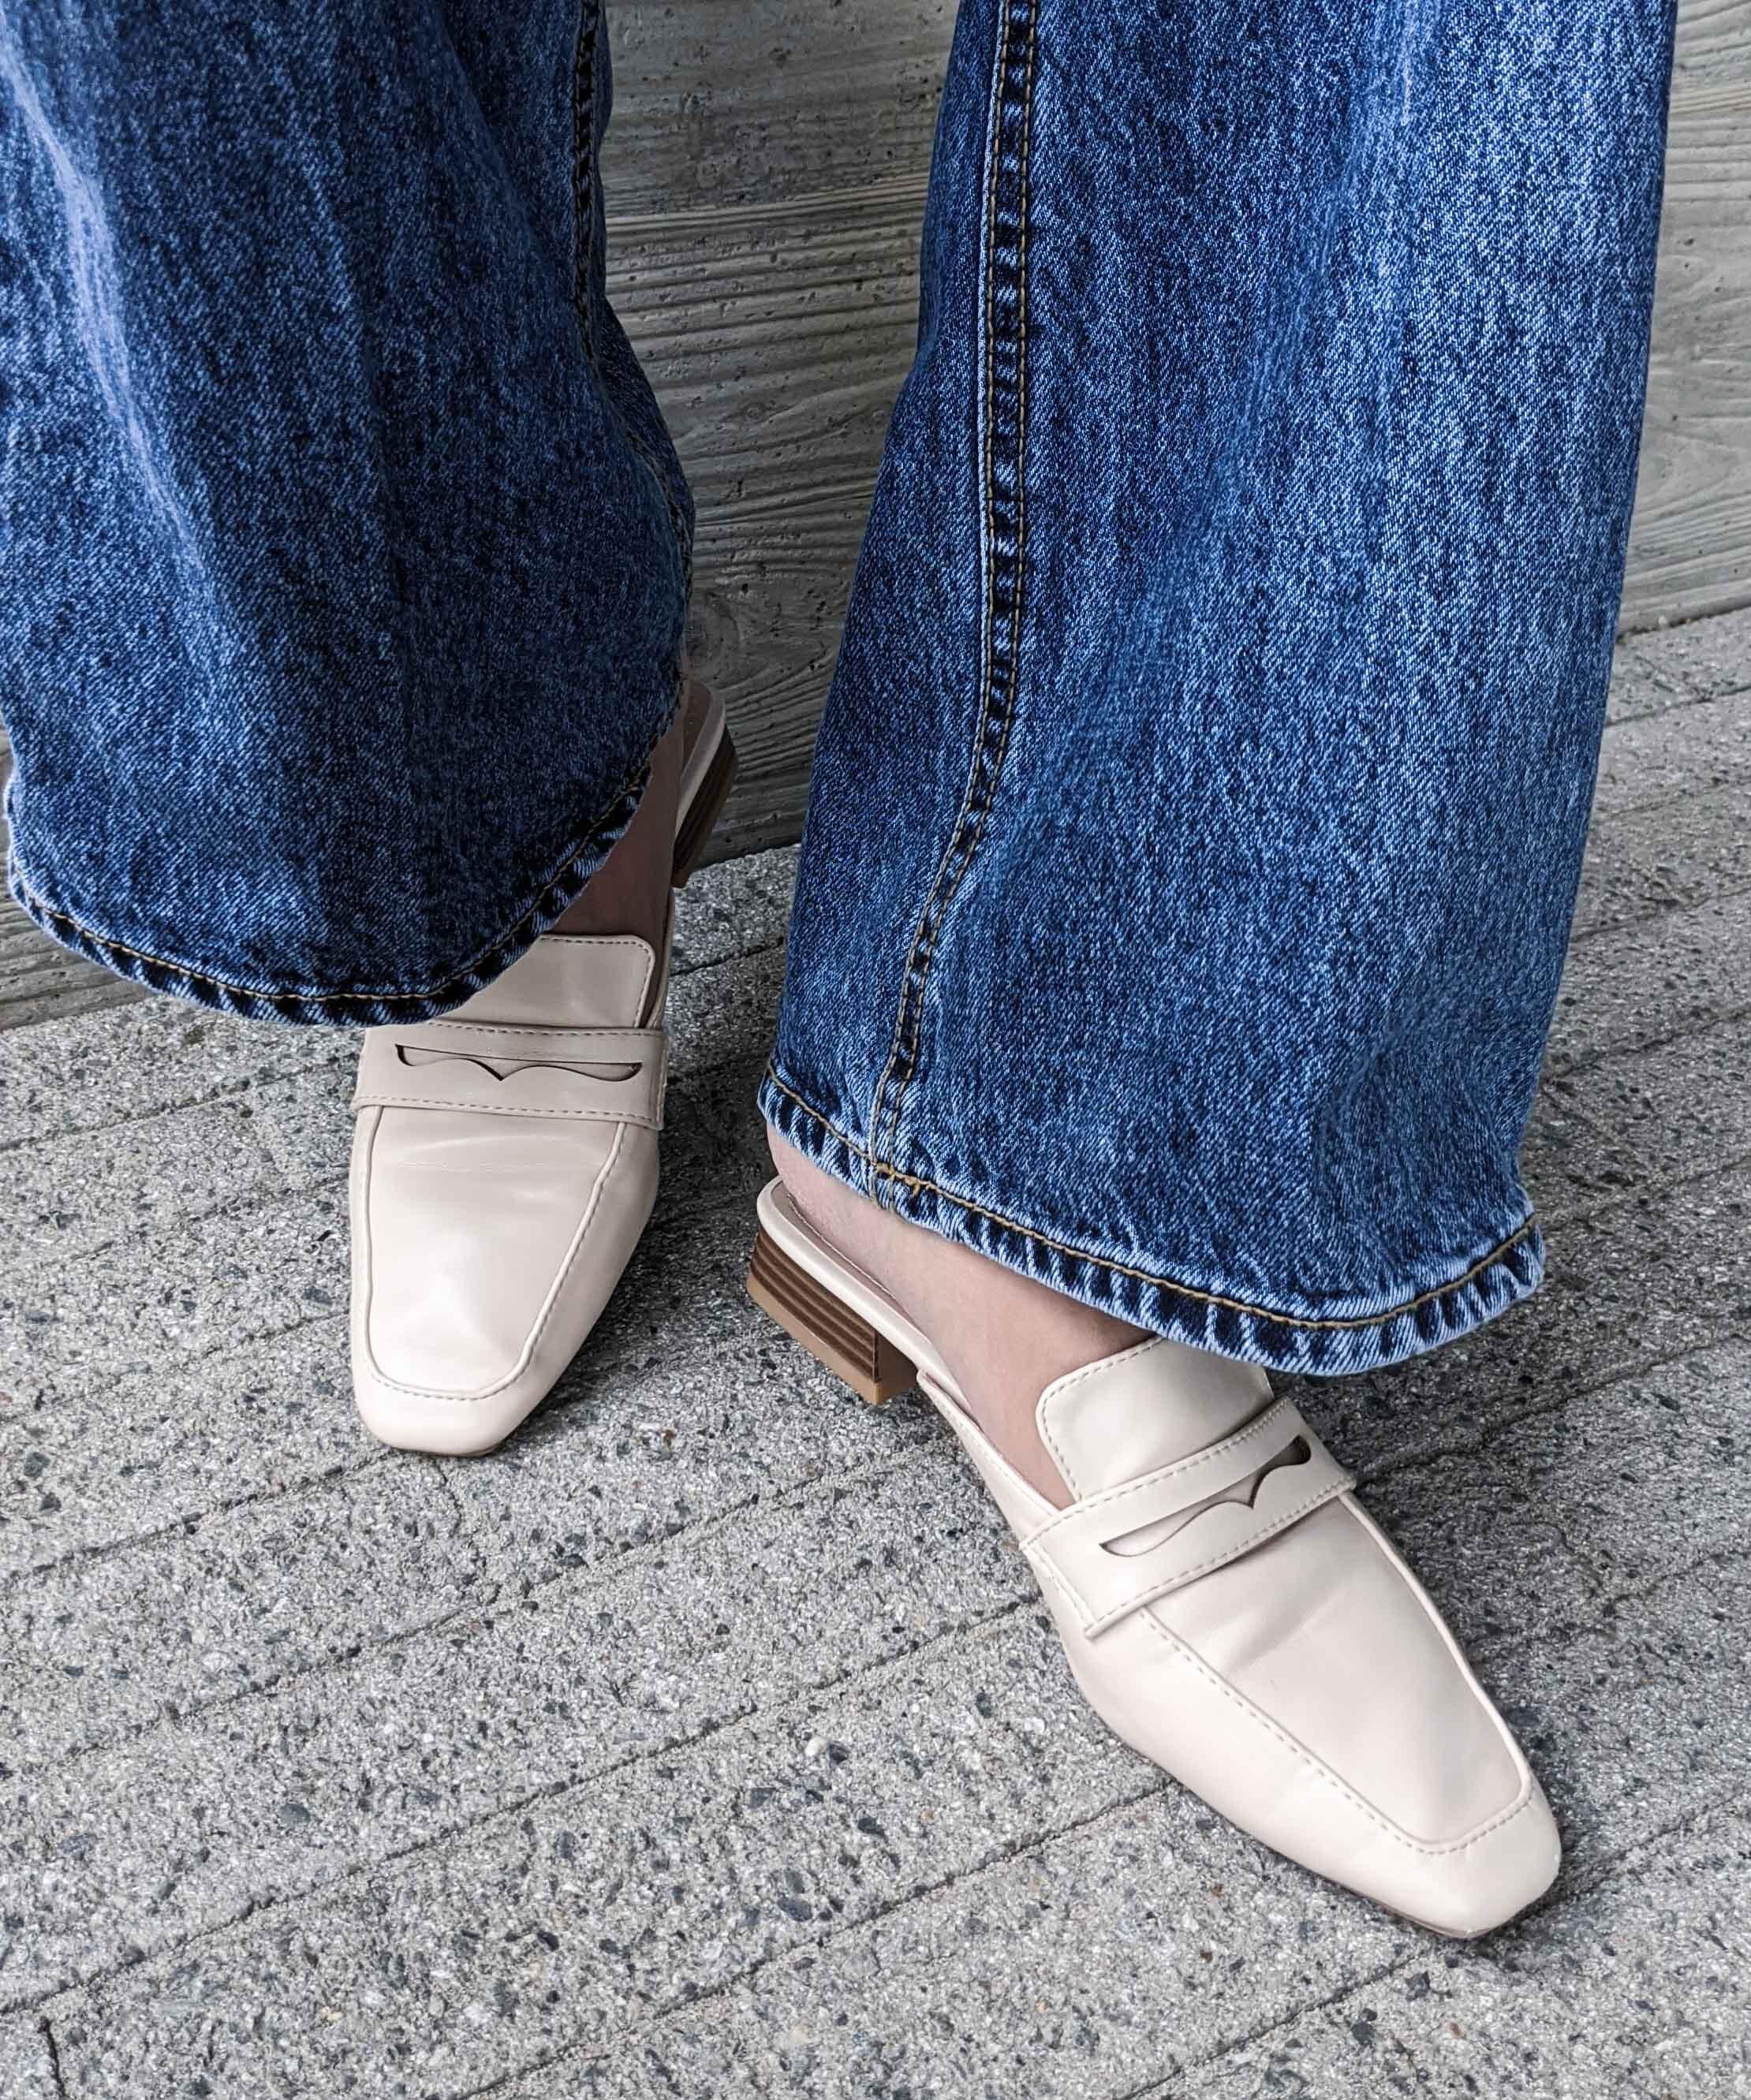 Square toe slipper